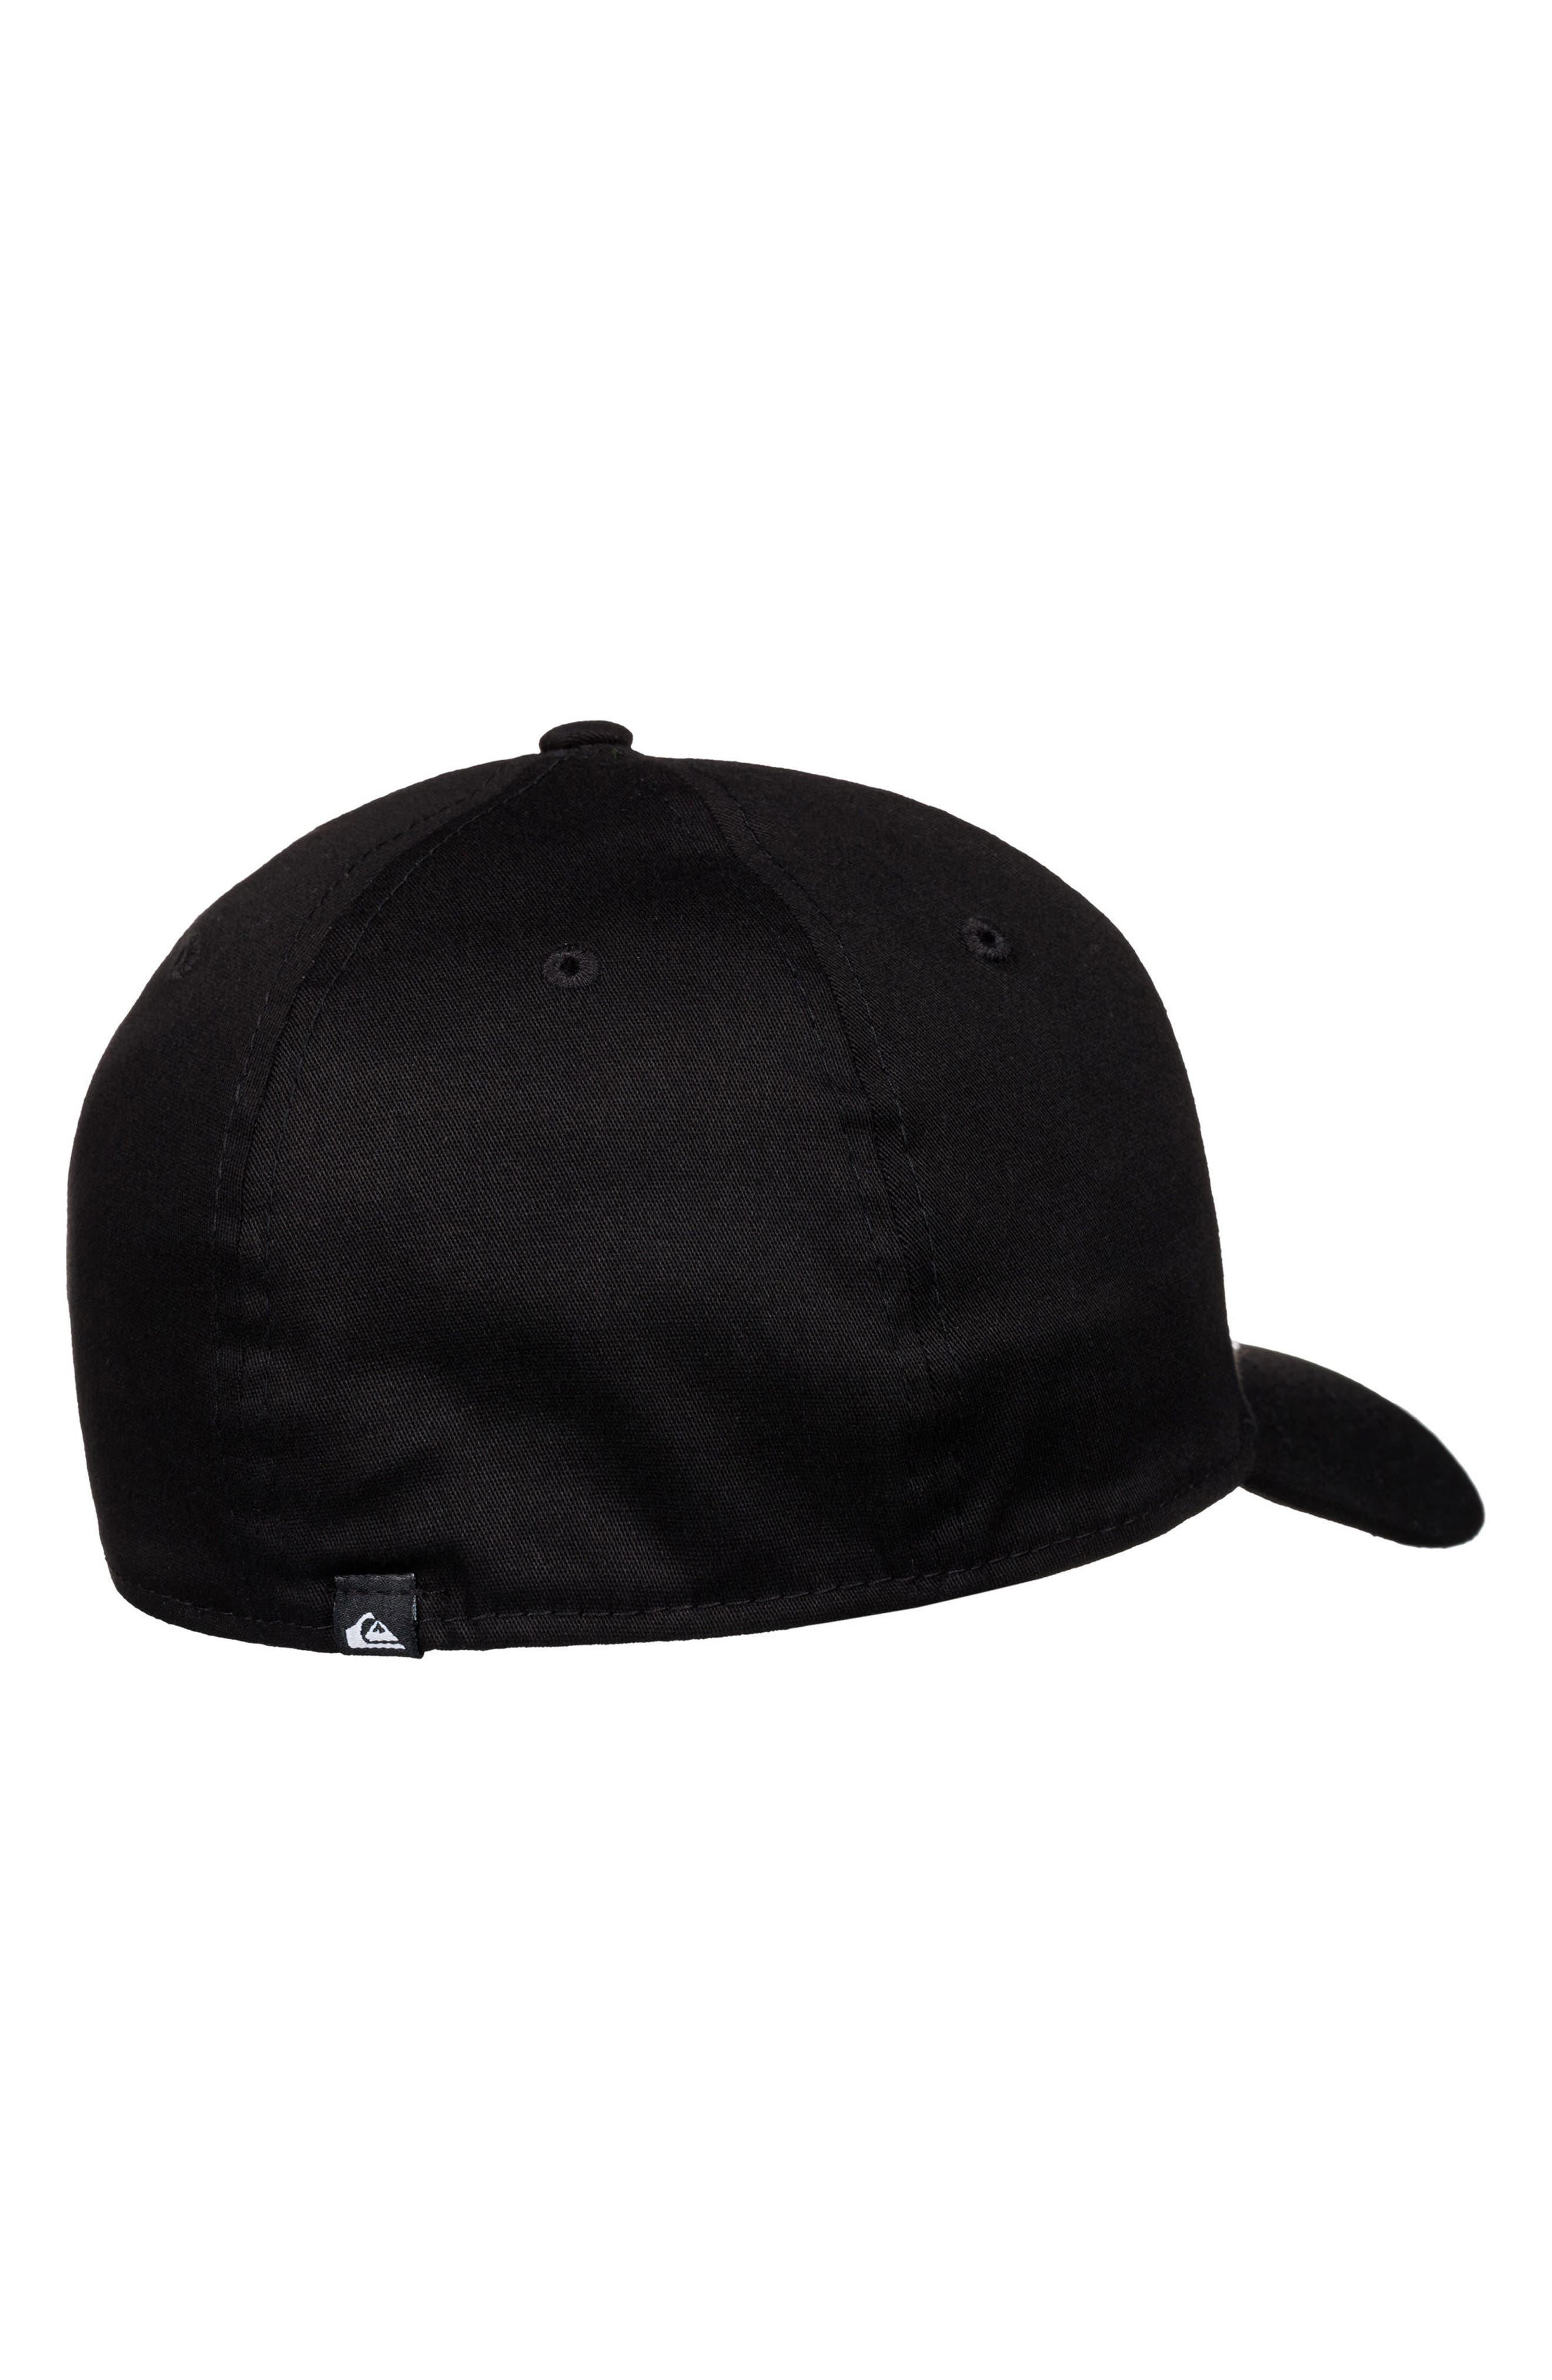 Mountain & Wave Baseball Cap,                             Alternate thumbnail 2, color,                             White